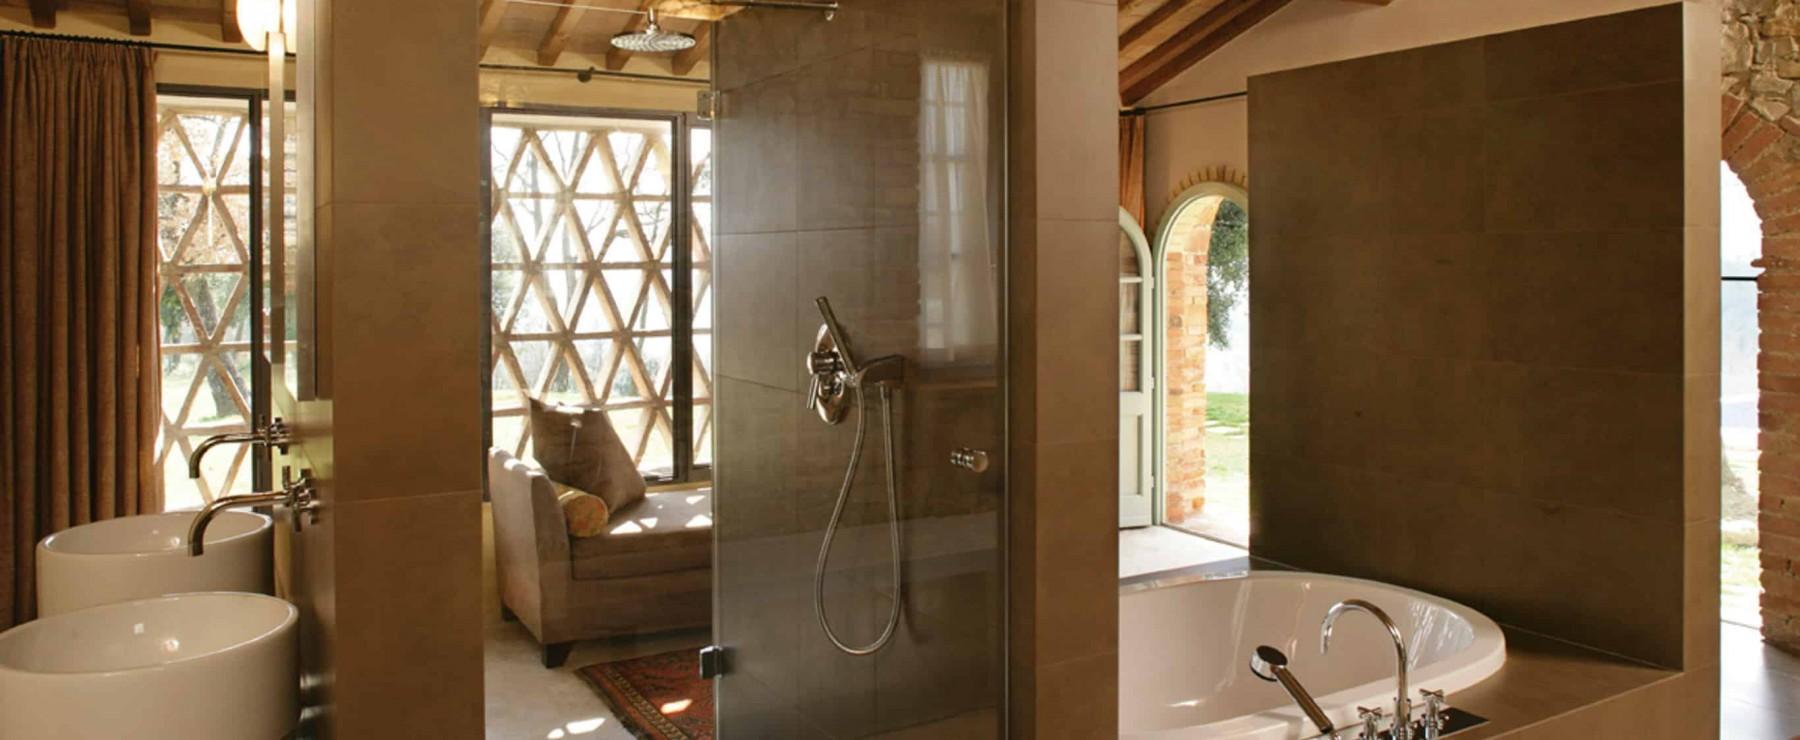 INDOOR Ξ Architecture Solution Tuscan Interior Style Bathroom